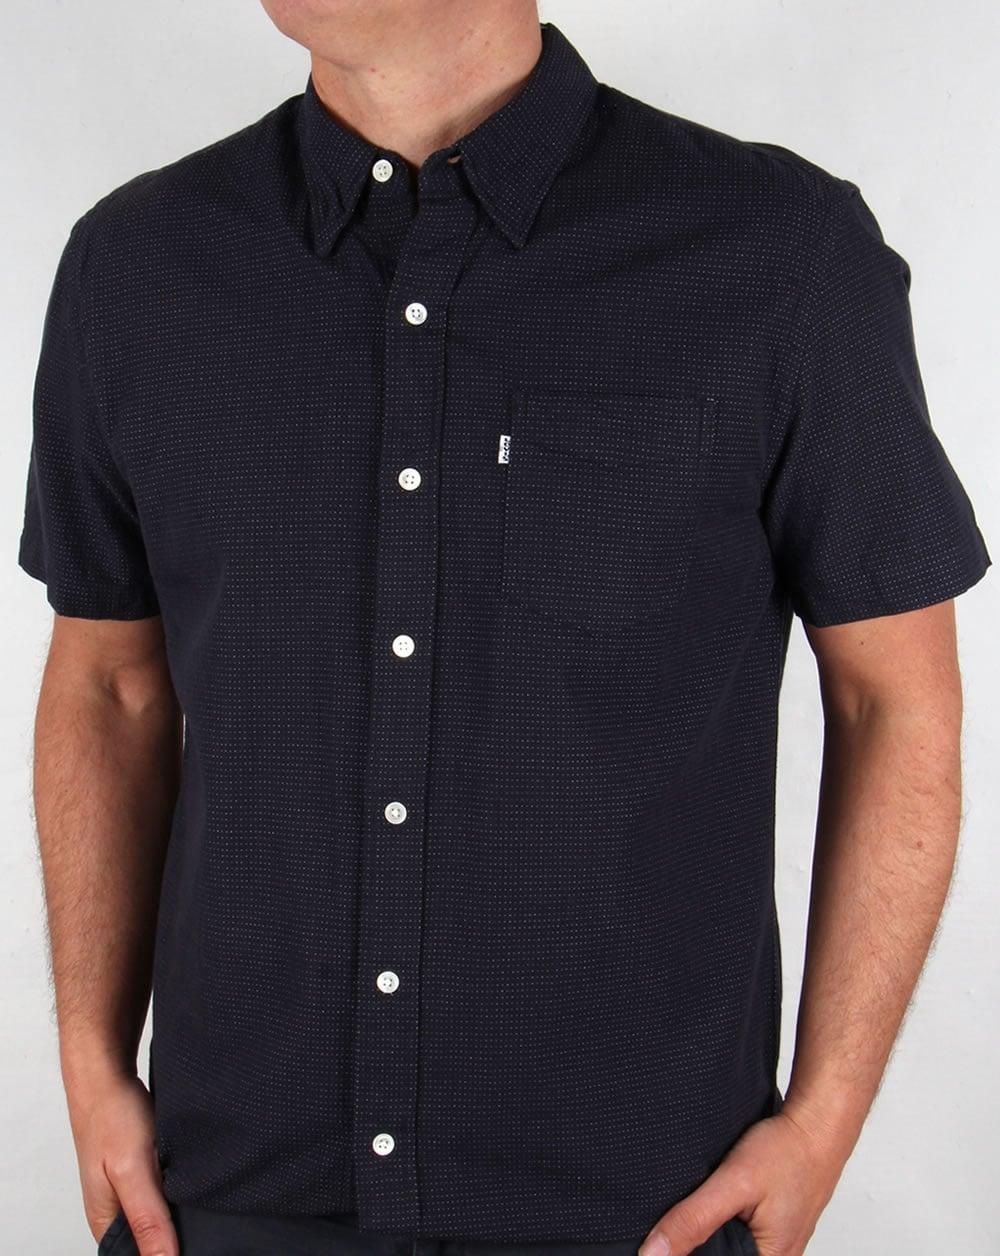 Levis Sunset One Pocket Short Sleeve Shirt Dark Indigo